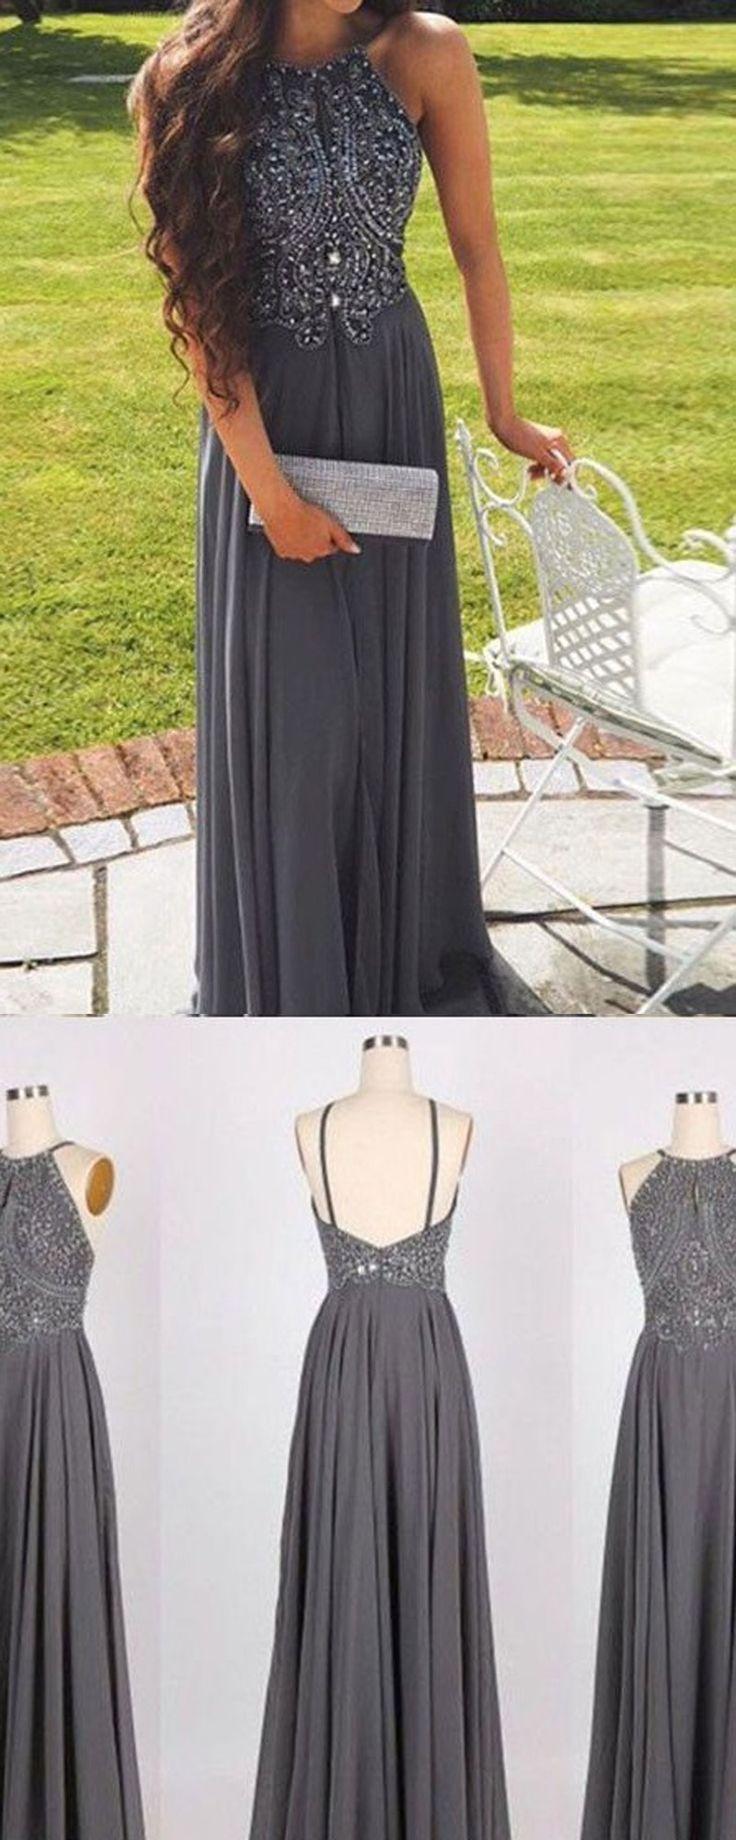 Hot selling aline prom dresshalter gray backless prom gownlong